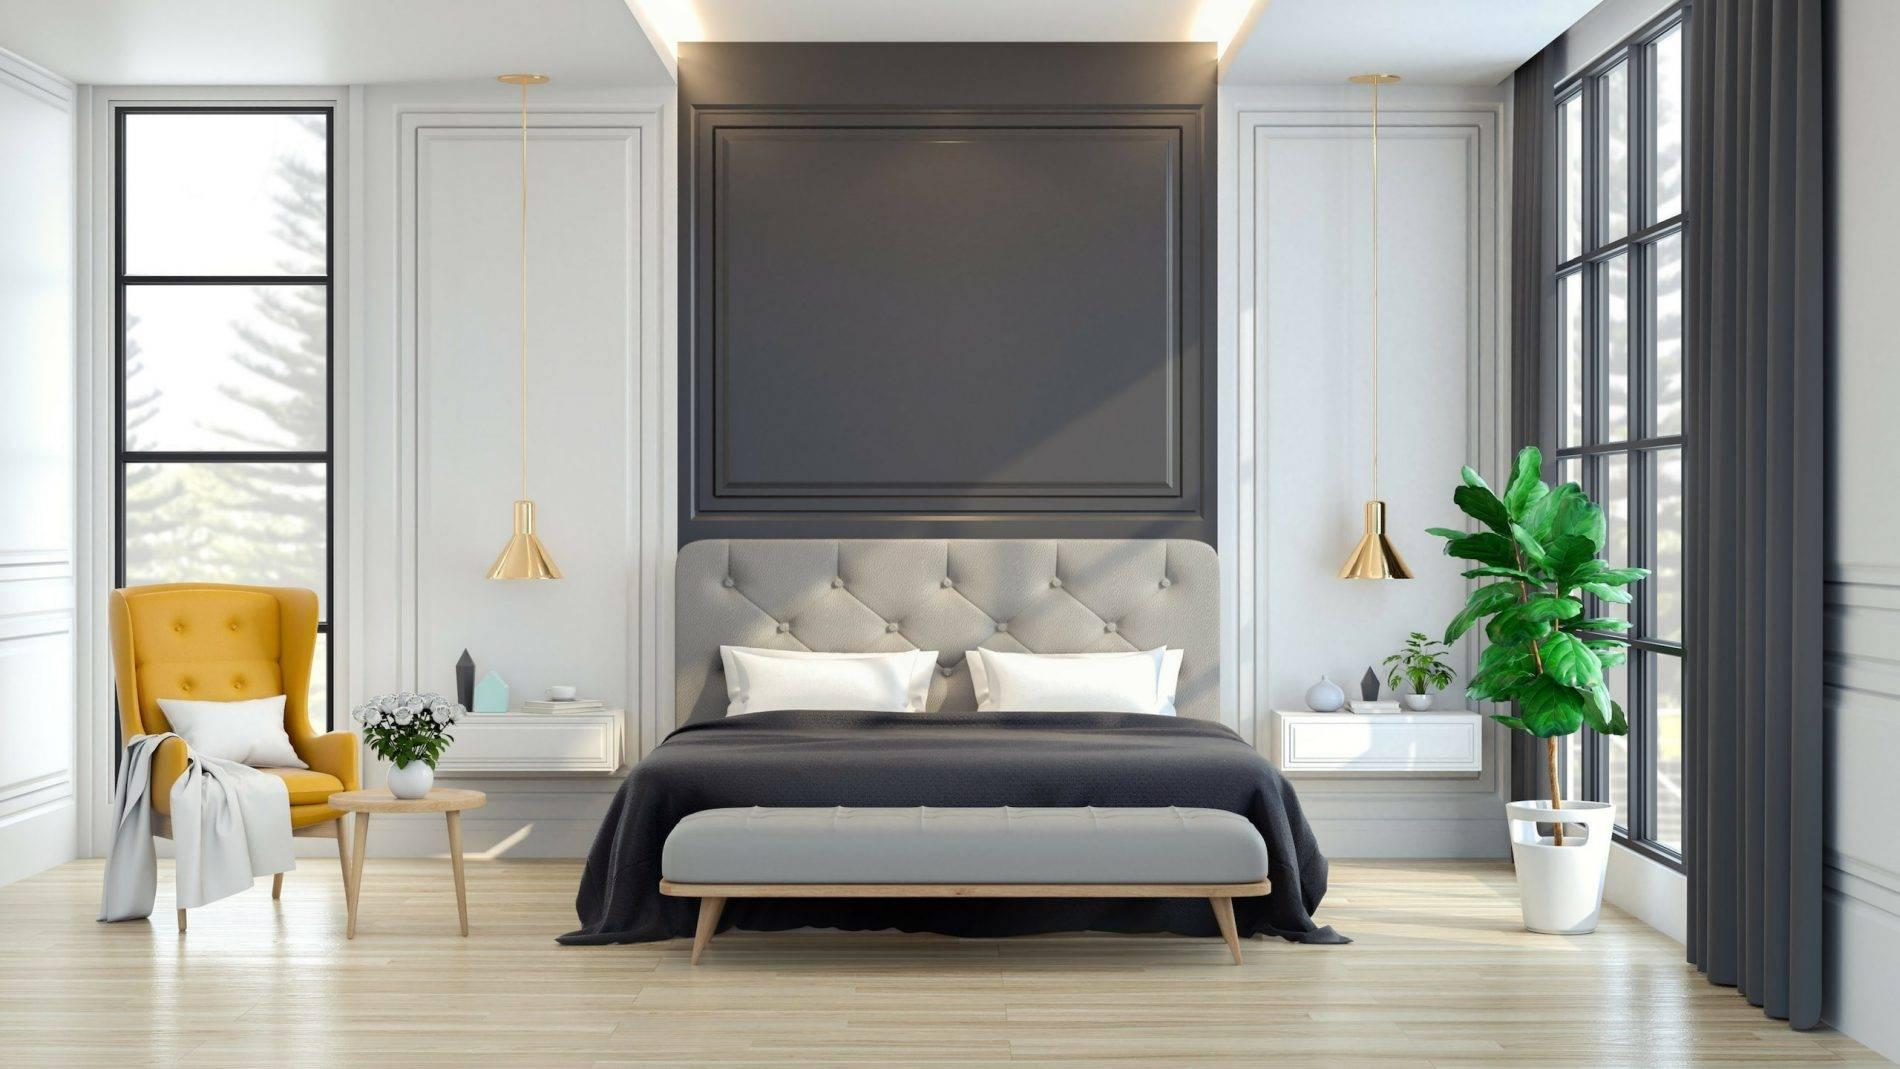 fabric beds popular 1900x1069